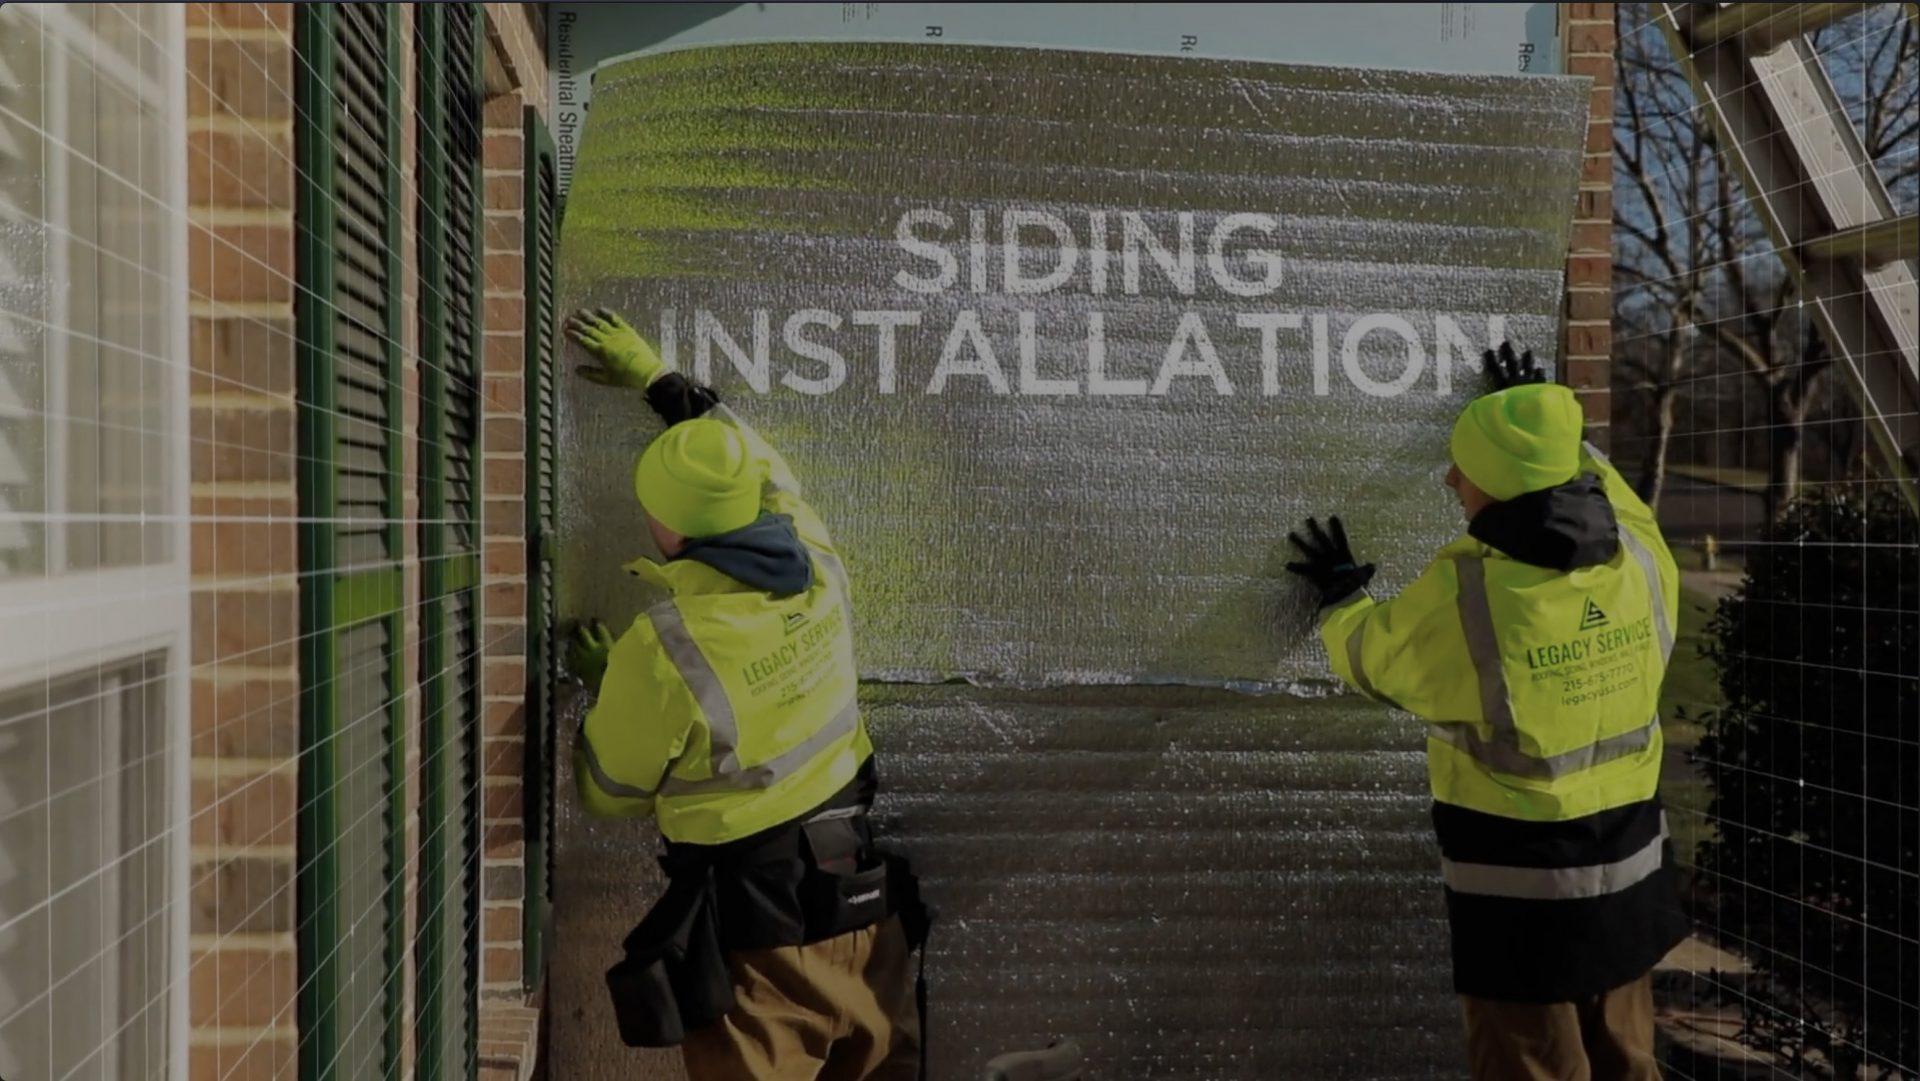 siding installation promo vidoe